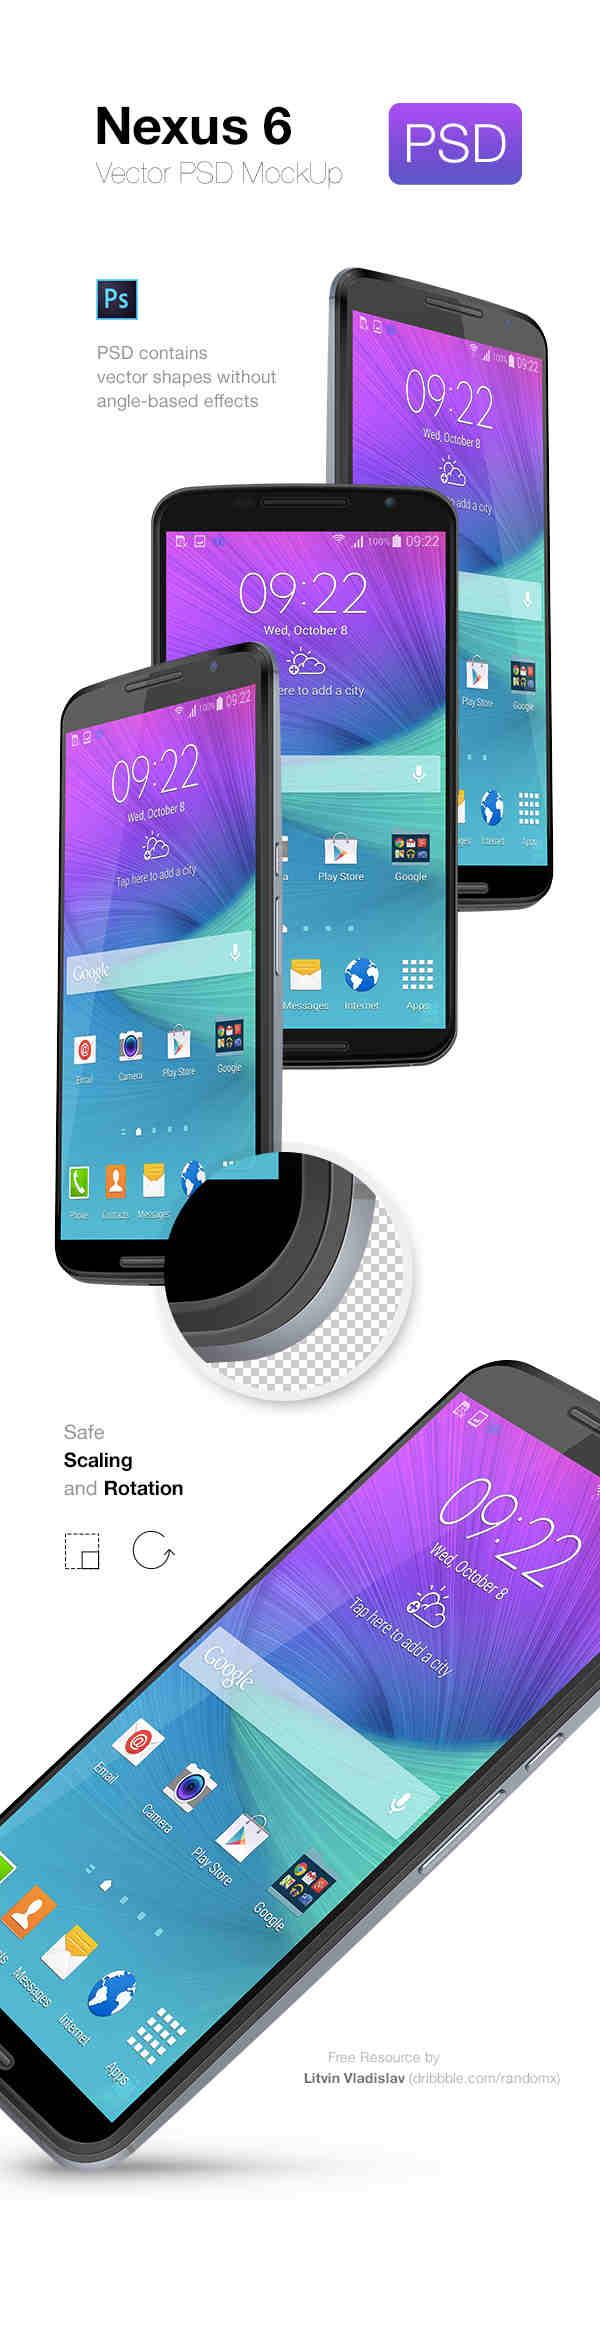 Realistic Nexus 6 Mockup